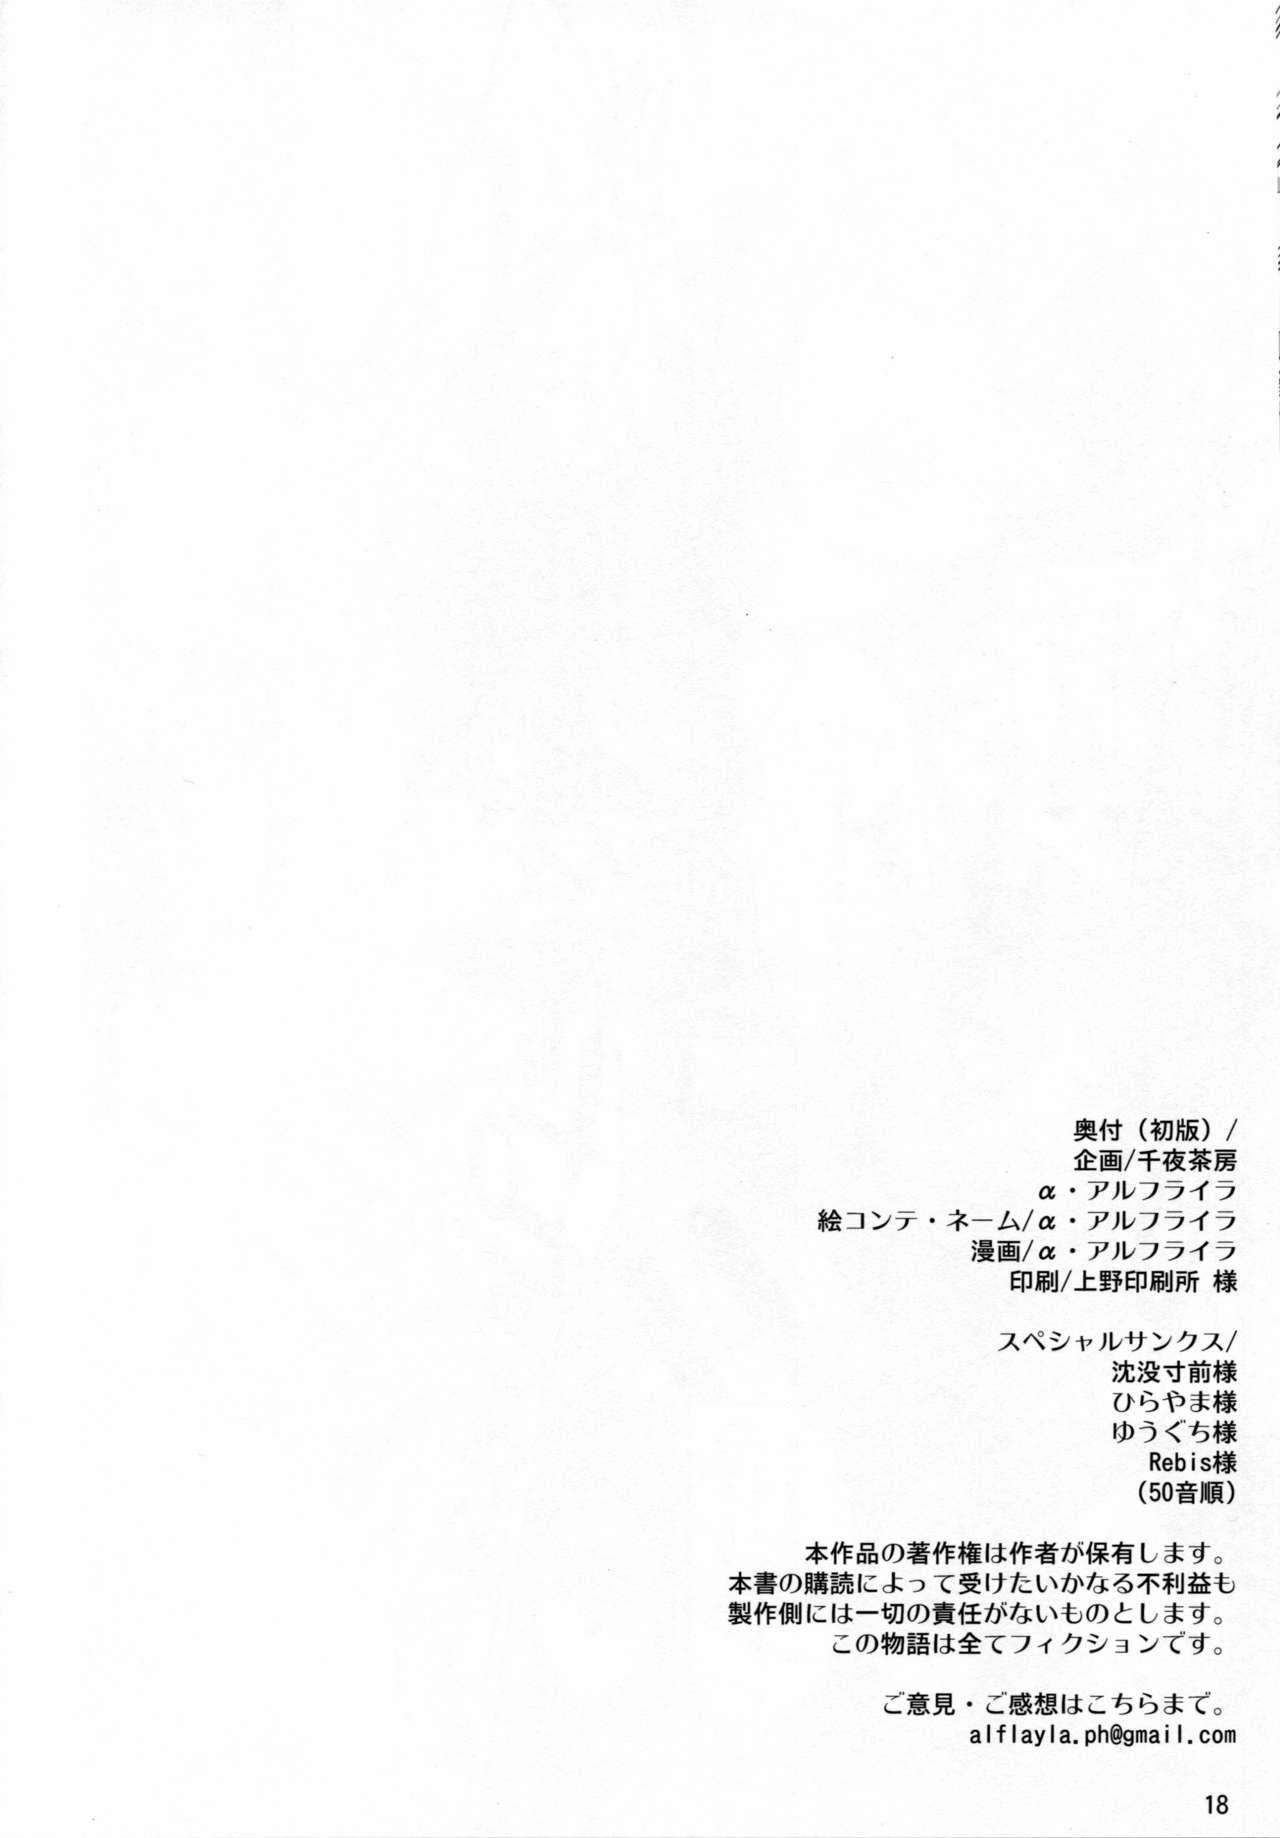 Futanari Onee-san x Otokonoko Cosplayer ♥ Mesu Ochi Choukyou Part 2 16